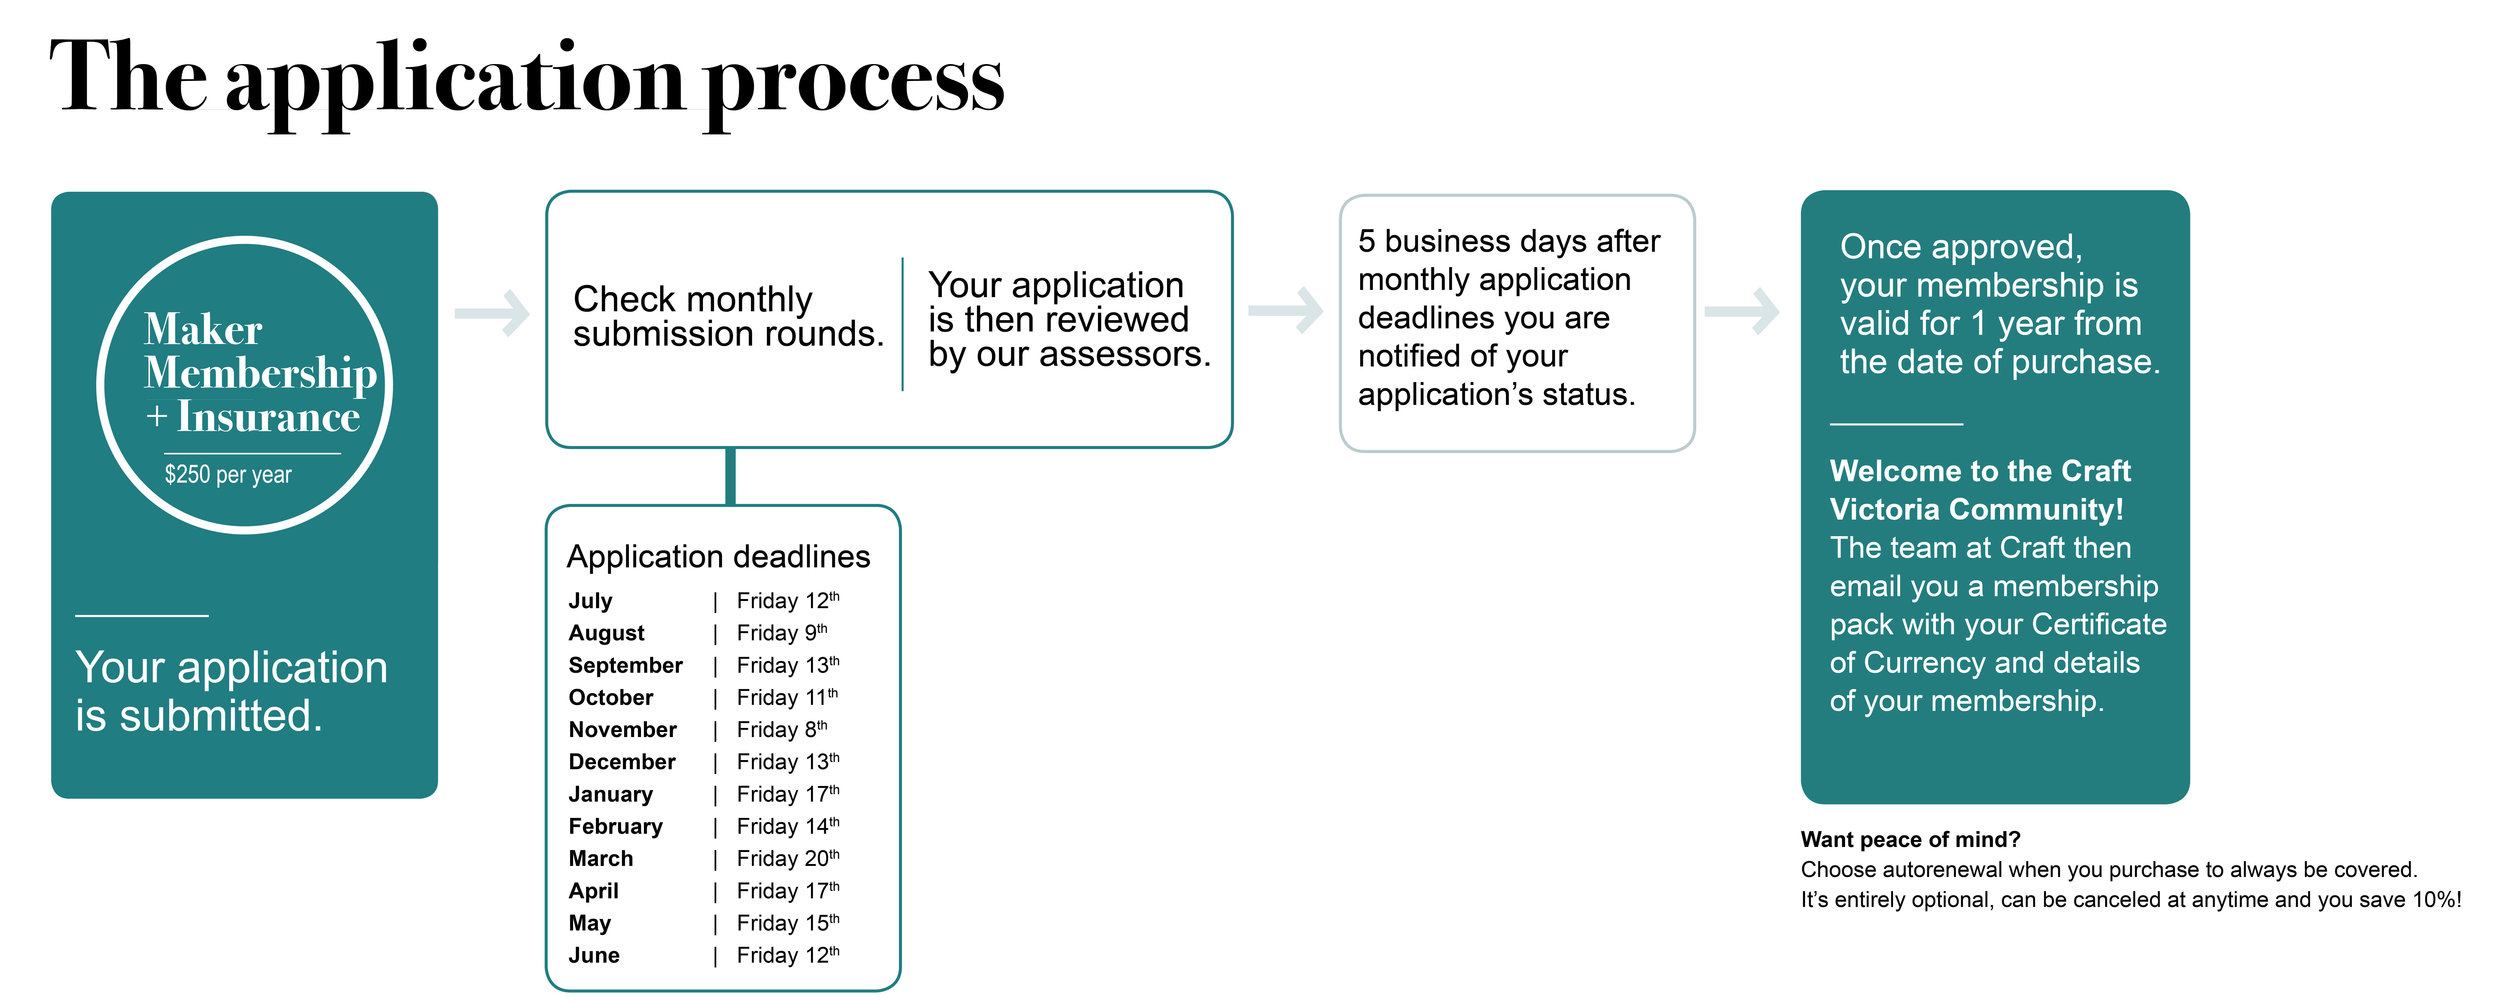 applicationprocess23.jpg